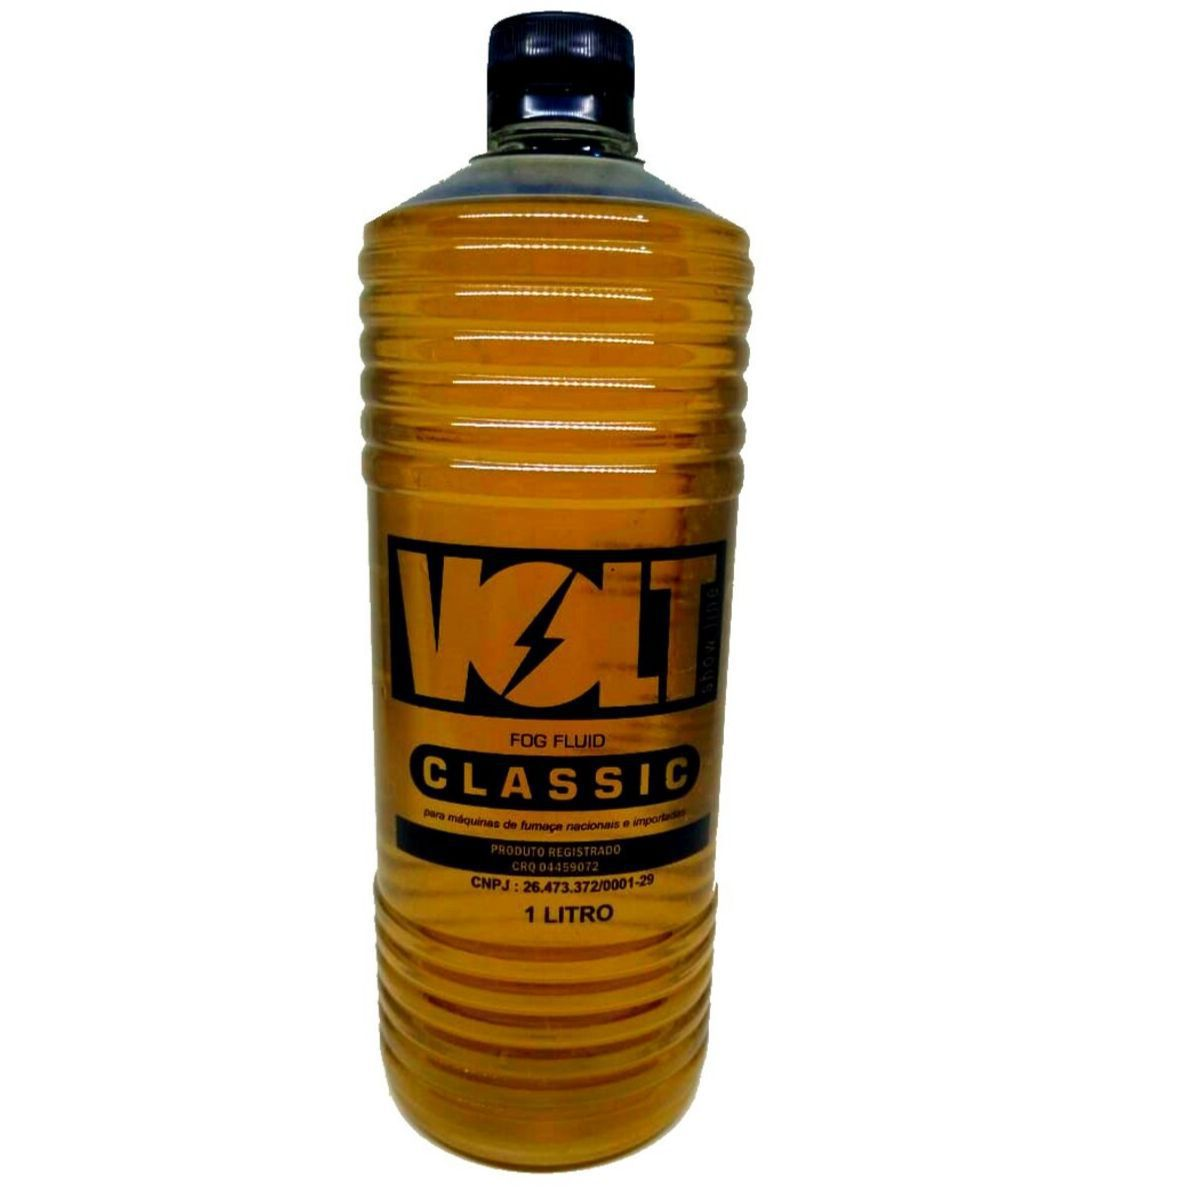 Kit 6x Carga Para Maquina de Fumaça 1 Litro Classic Volt  - MY1012